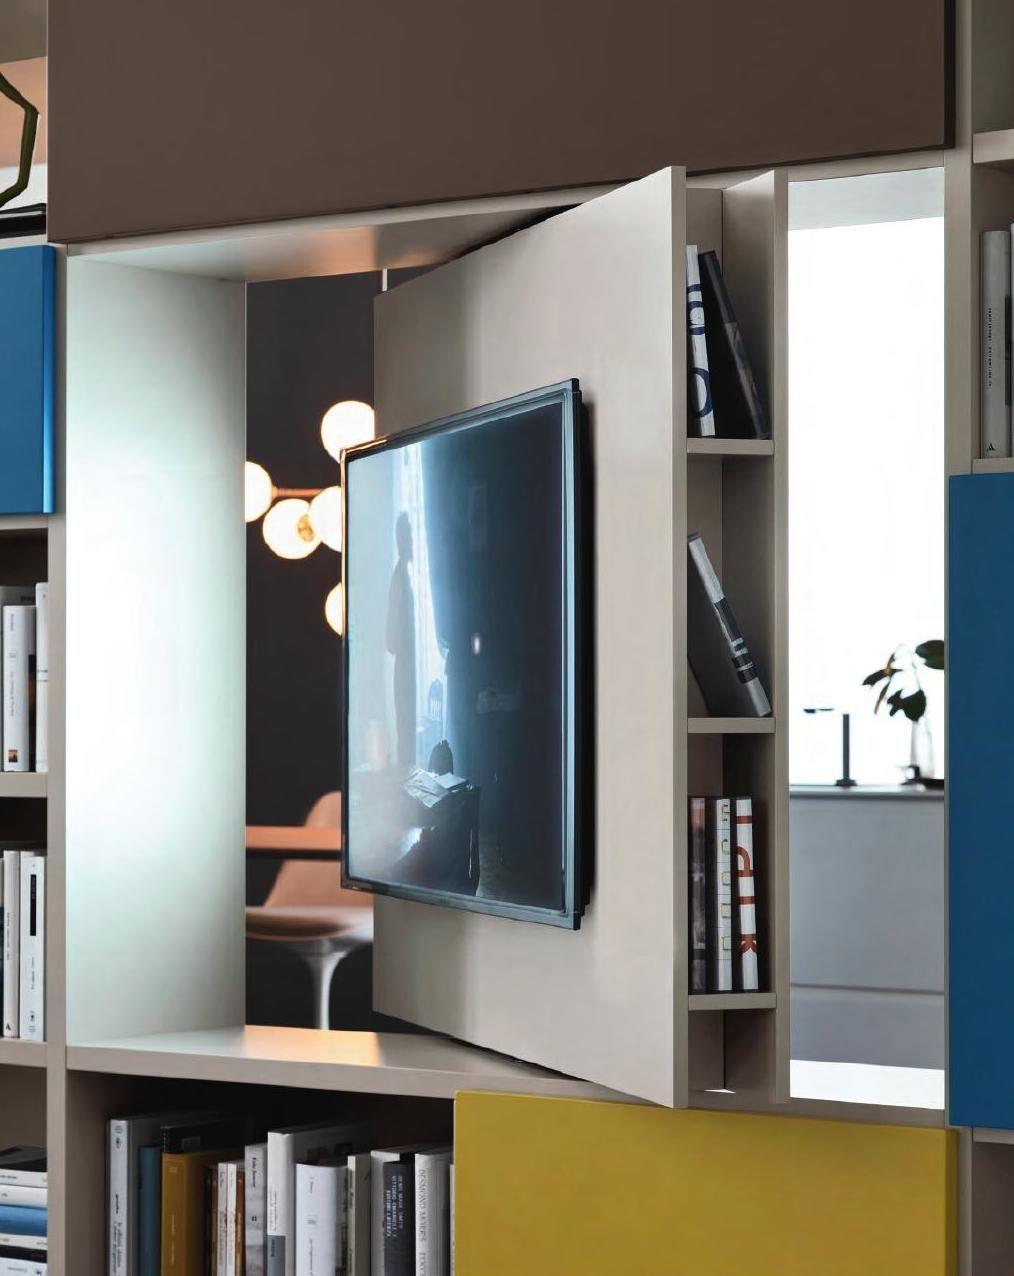 Modo raumtrenner raumteiler f r kleine r ume - Raumteiler tv wand ...